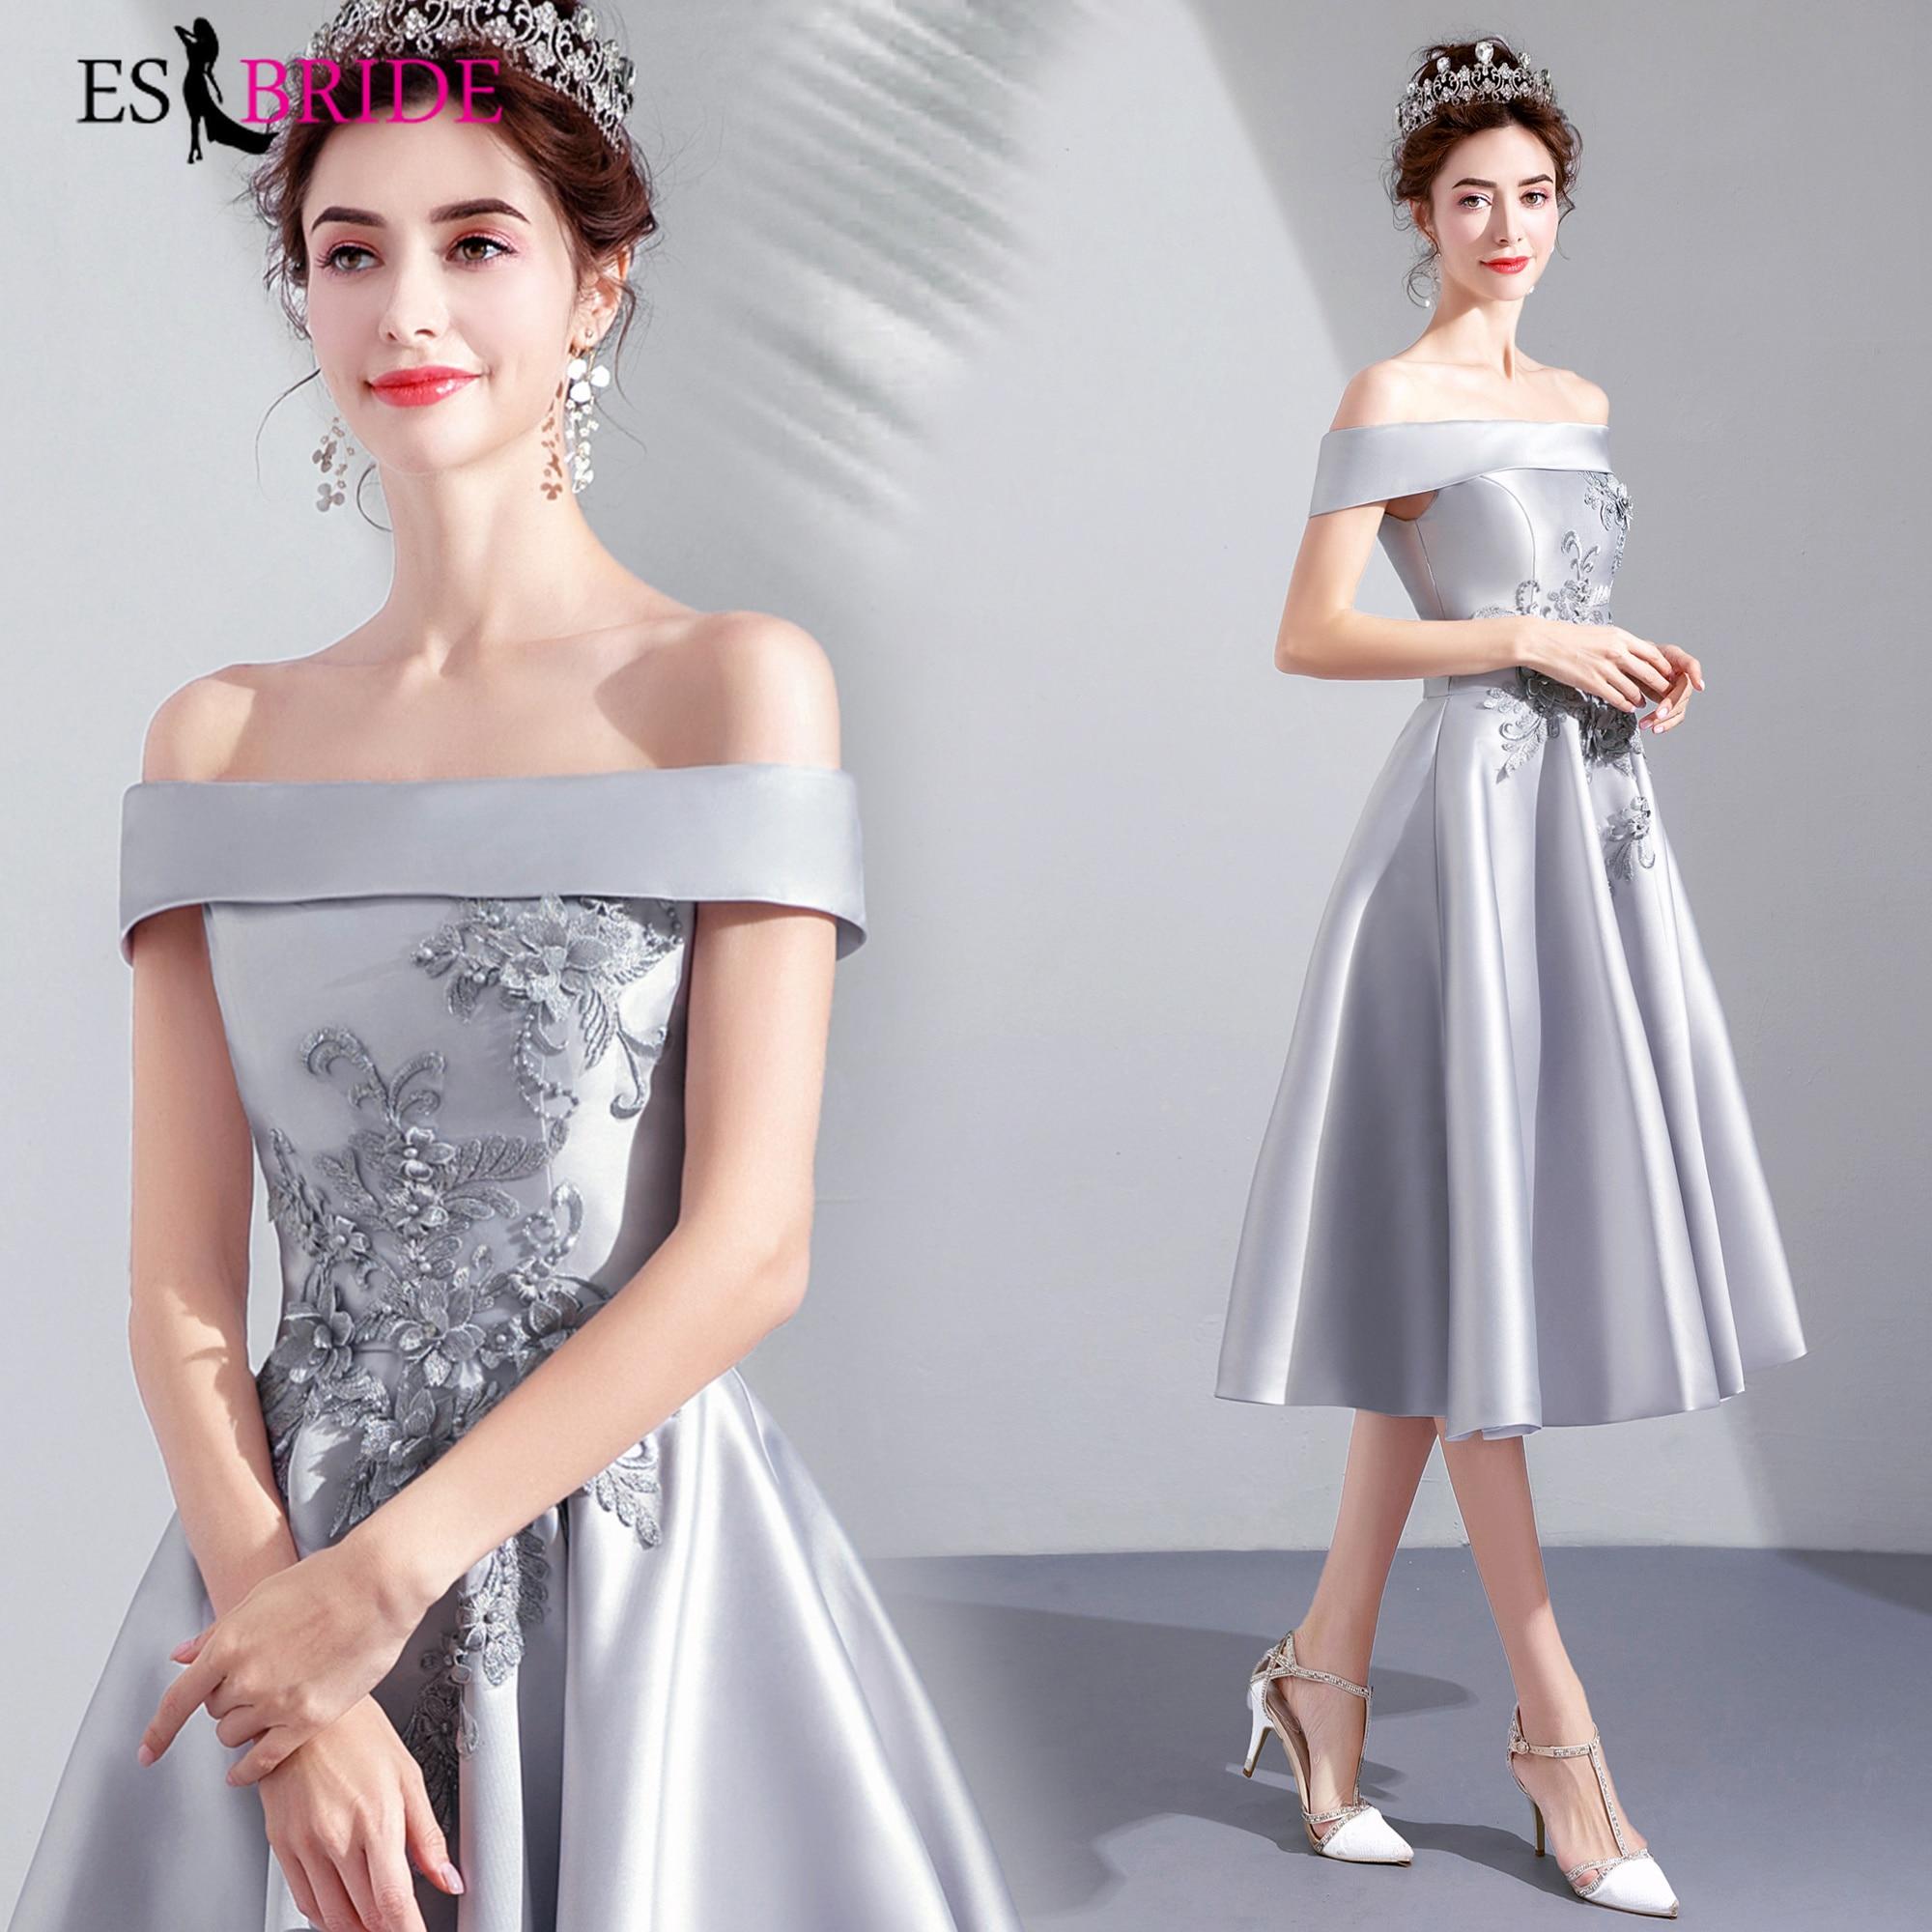 Slieve Simple Vestidos De Fiesta De Noche   Evening     Dress   Boat-neck Elegant Robe De Soiree   Evening     Dresses     Evening   Gown ES2147